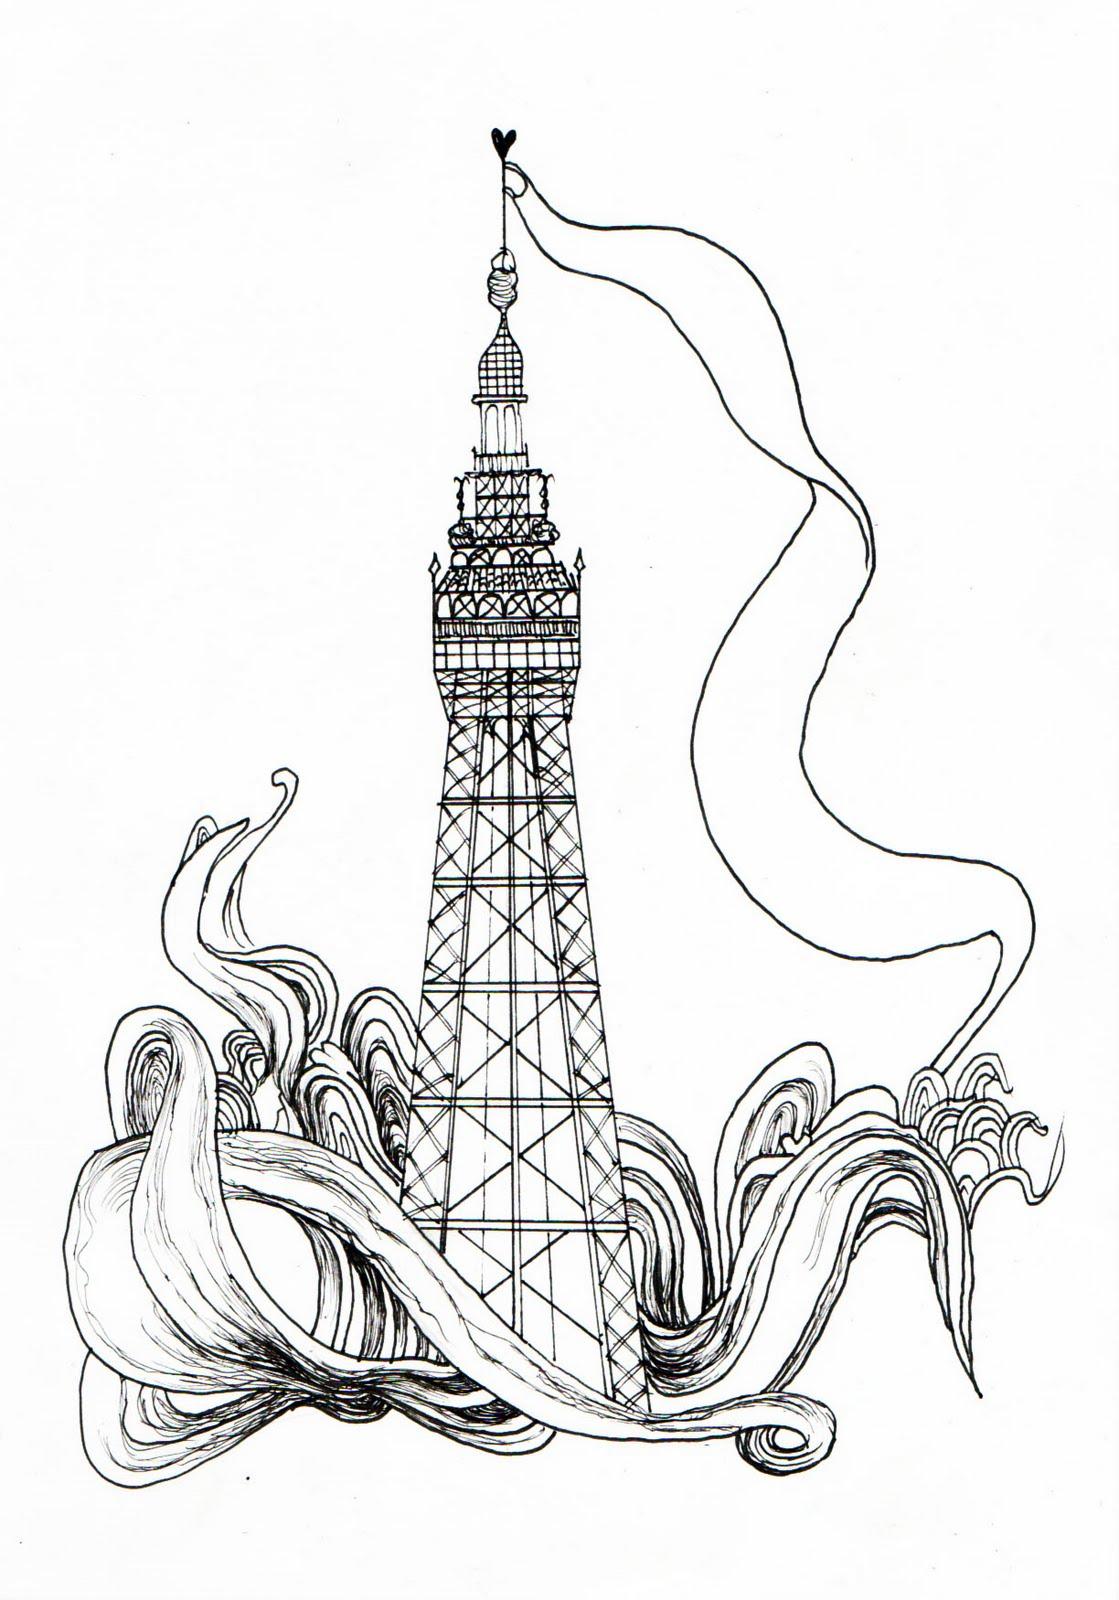 1119x1600 John Chamberlain Is Here Illustration For Music Magazine Rhubarb Bomb